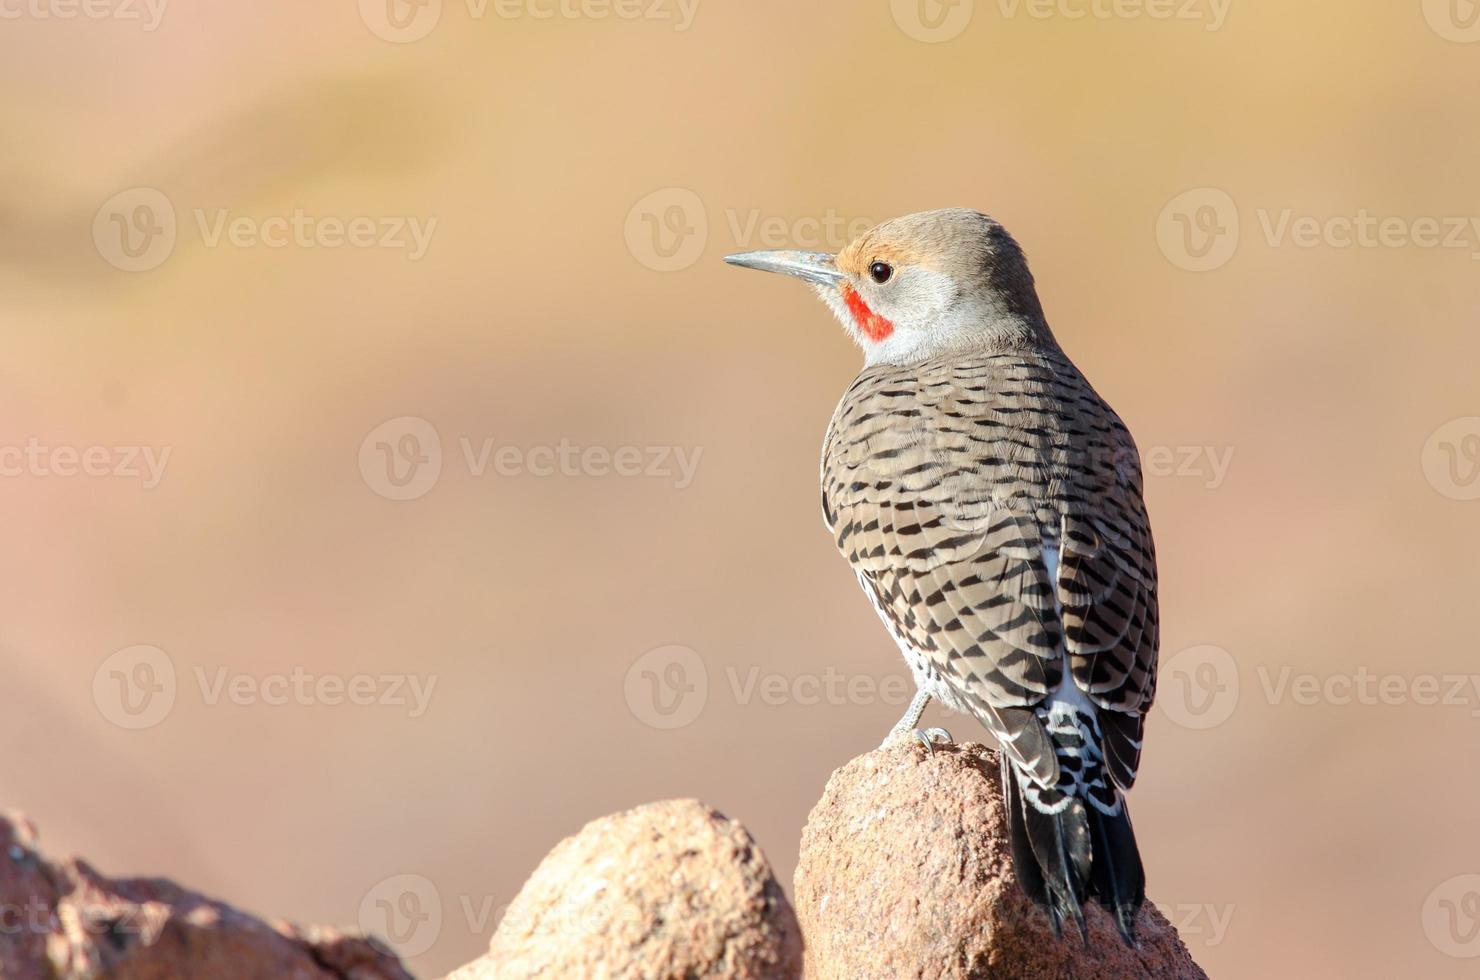 Northern Flicker (Colaptes auratus) photo